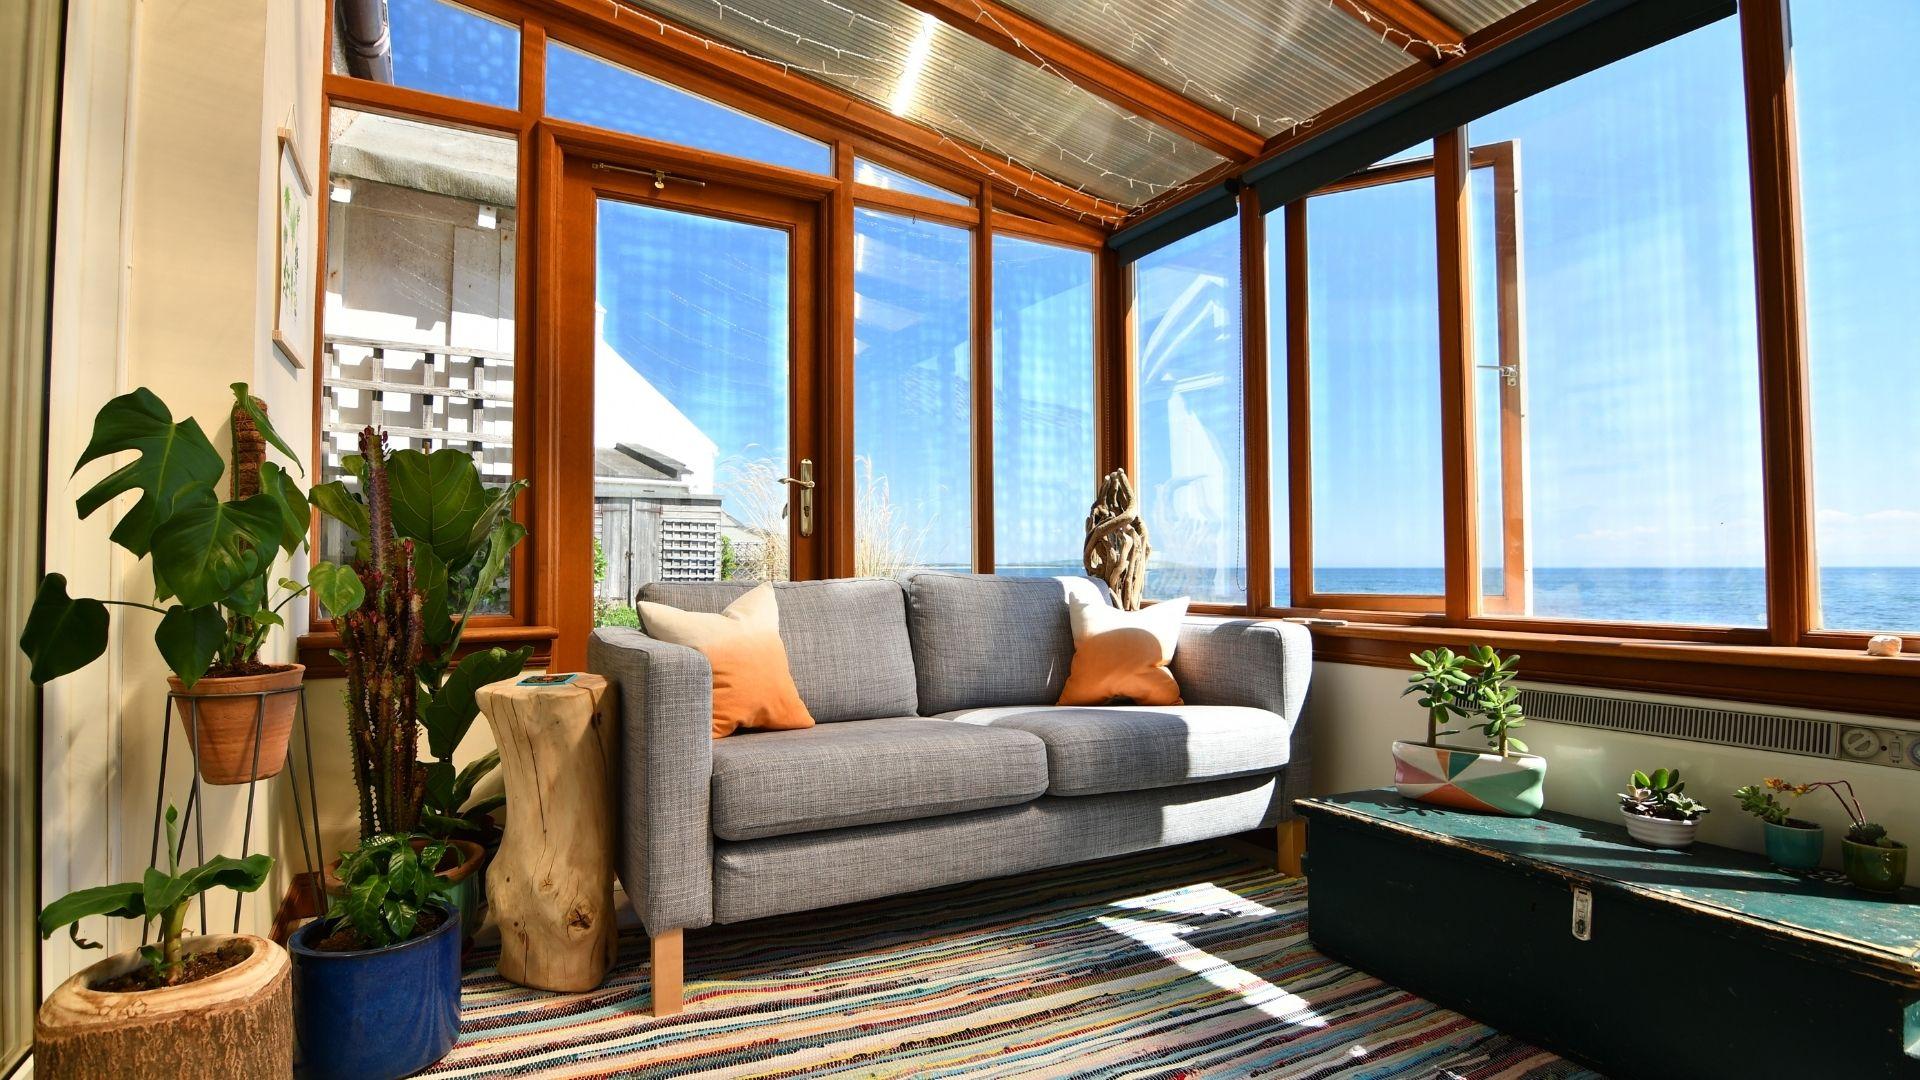 5 trucos para vender tu casa rápido con Inmobiliaria Montalbán